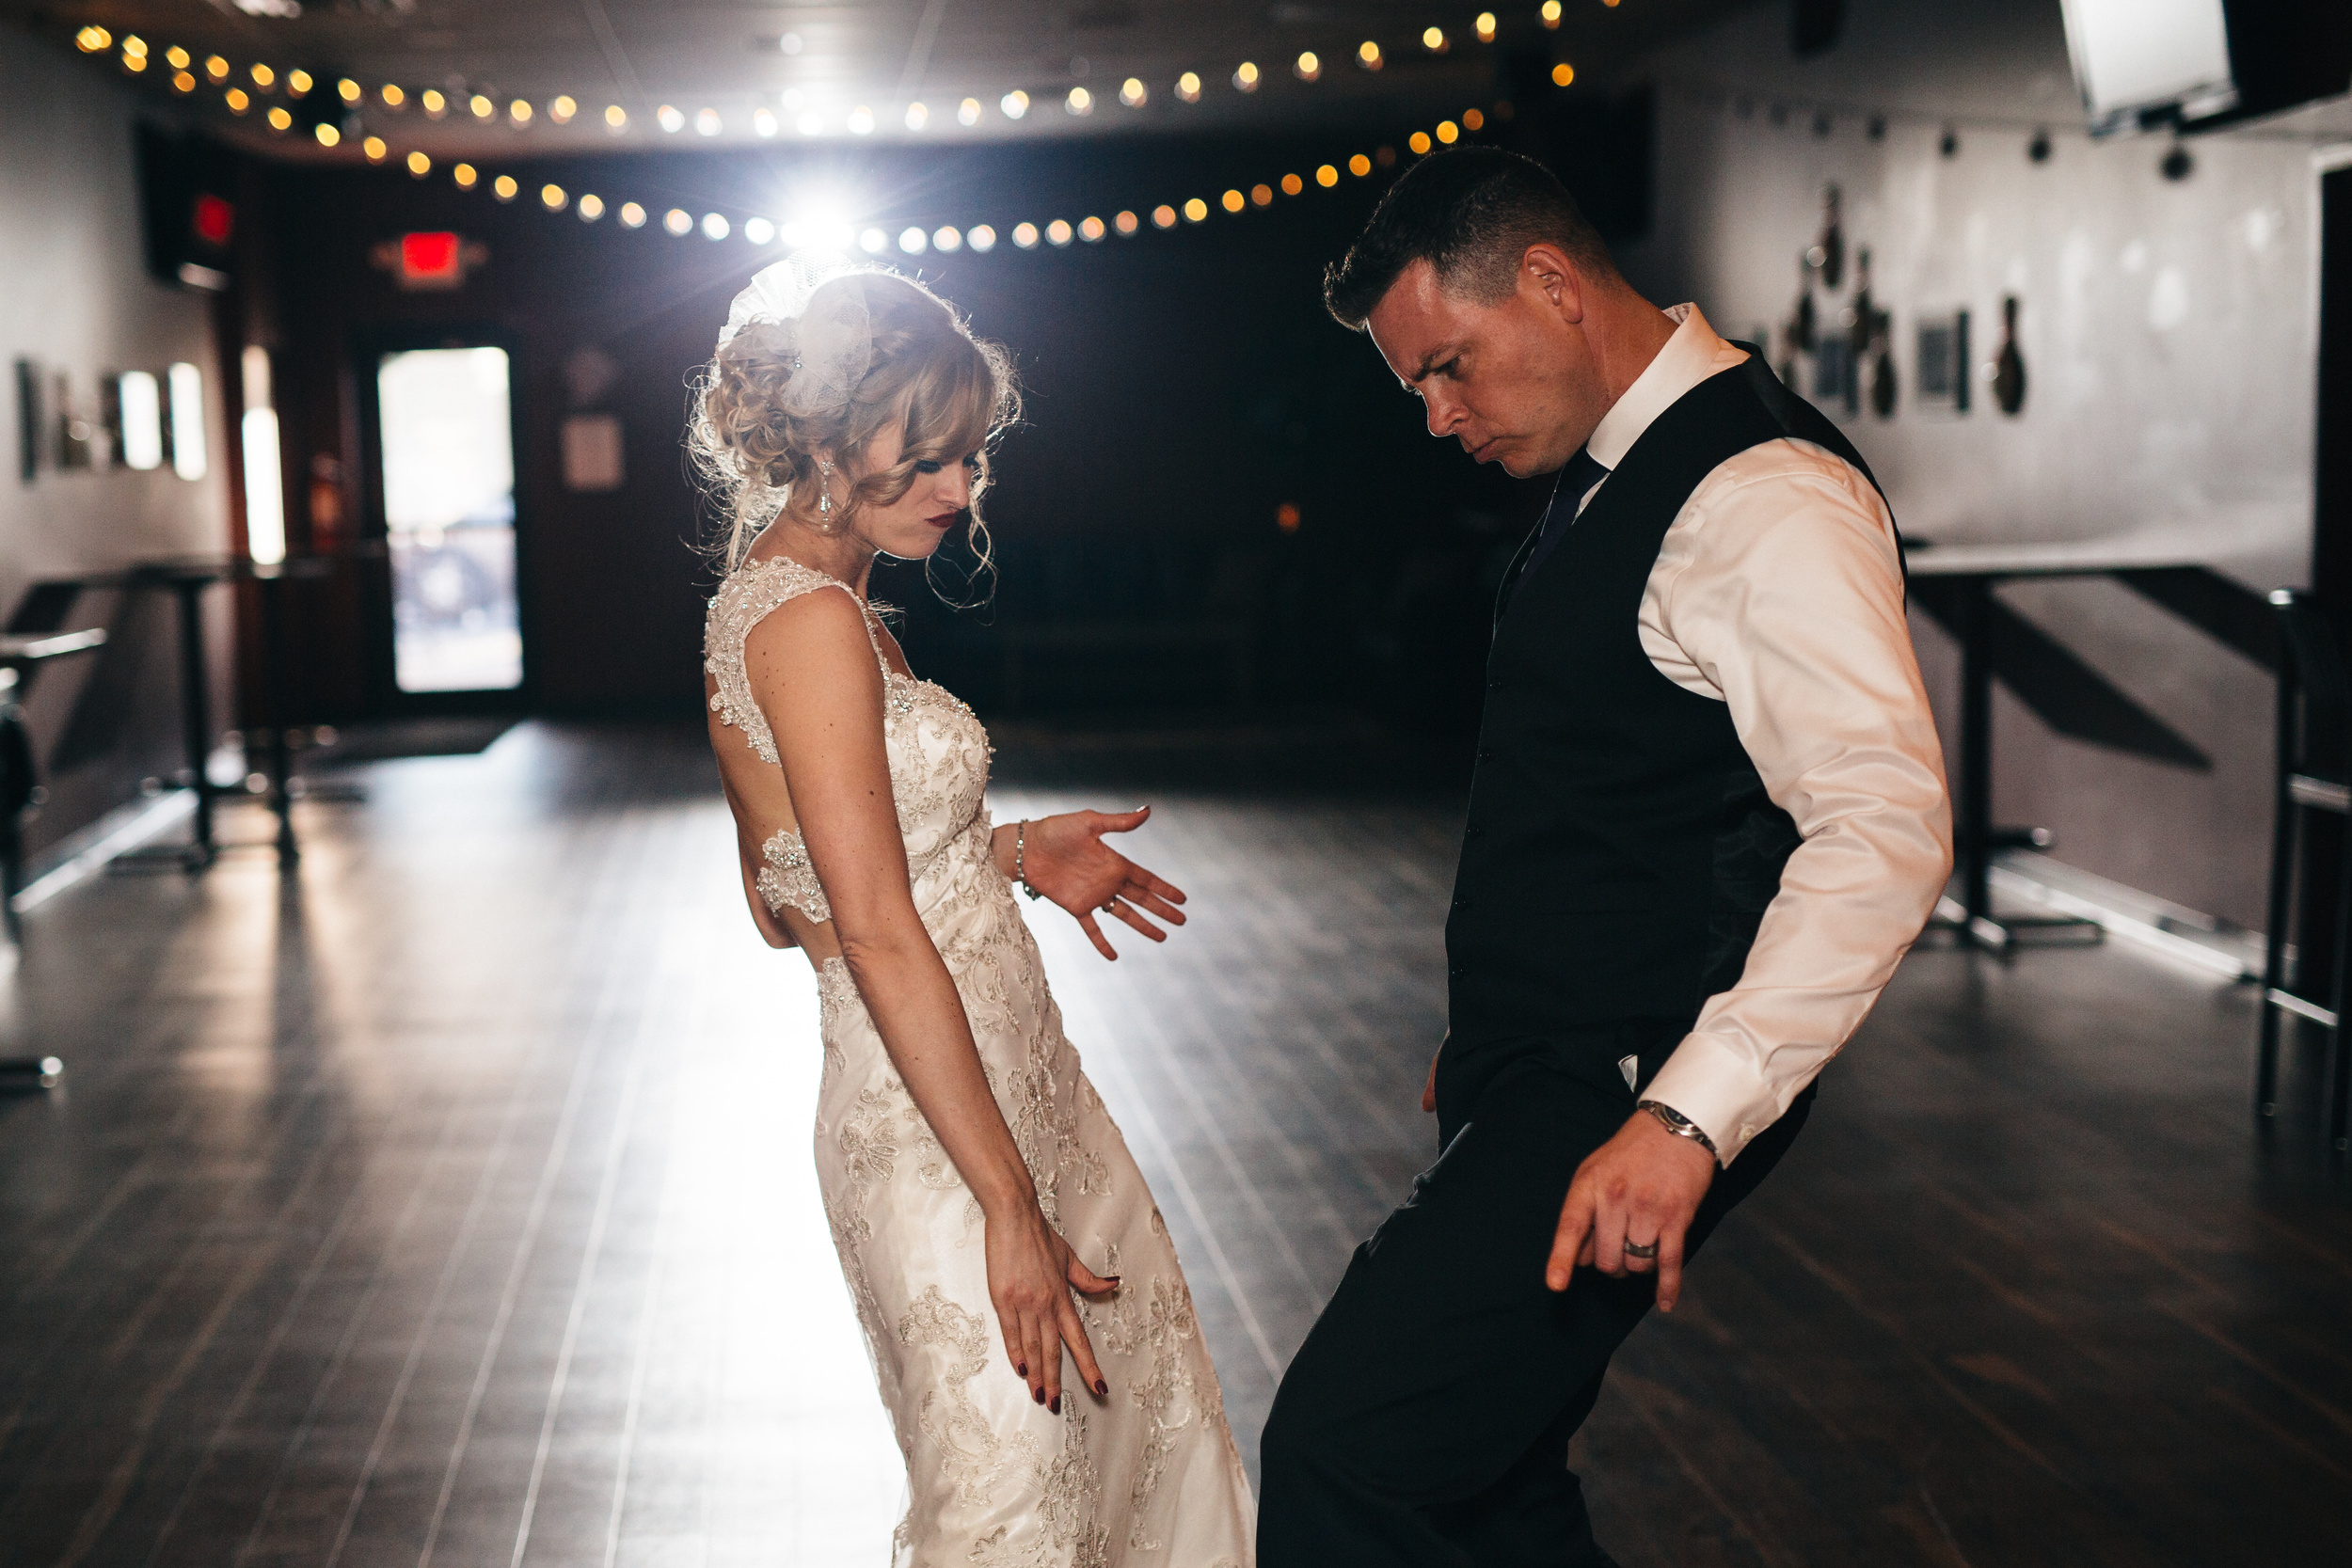 Bride and groom dance at wedding reception.